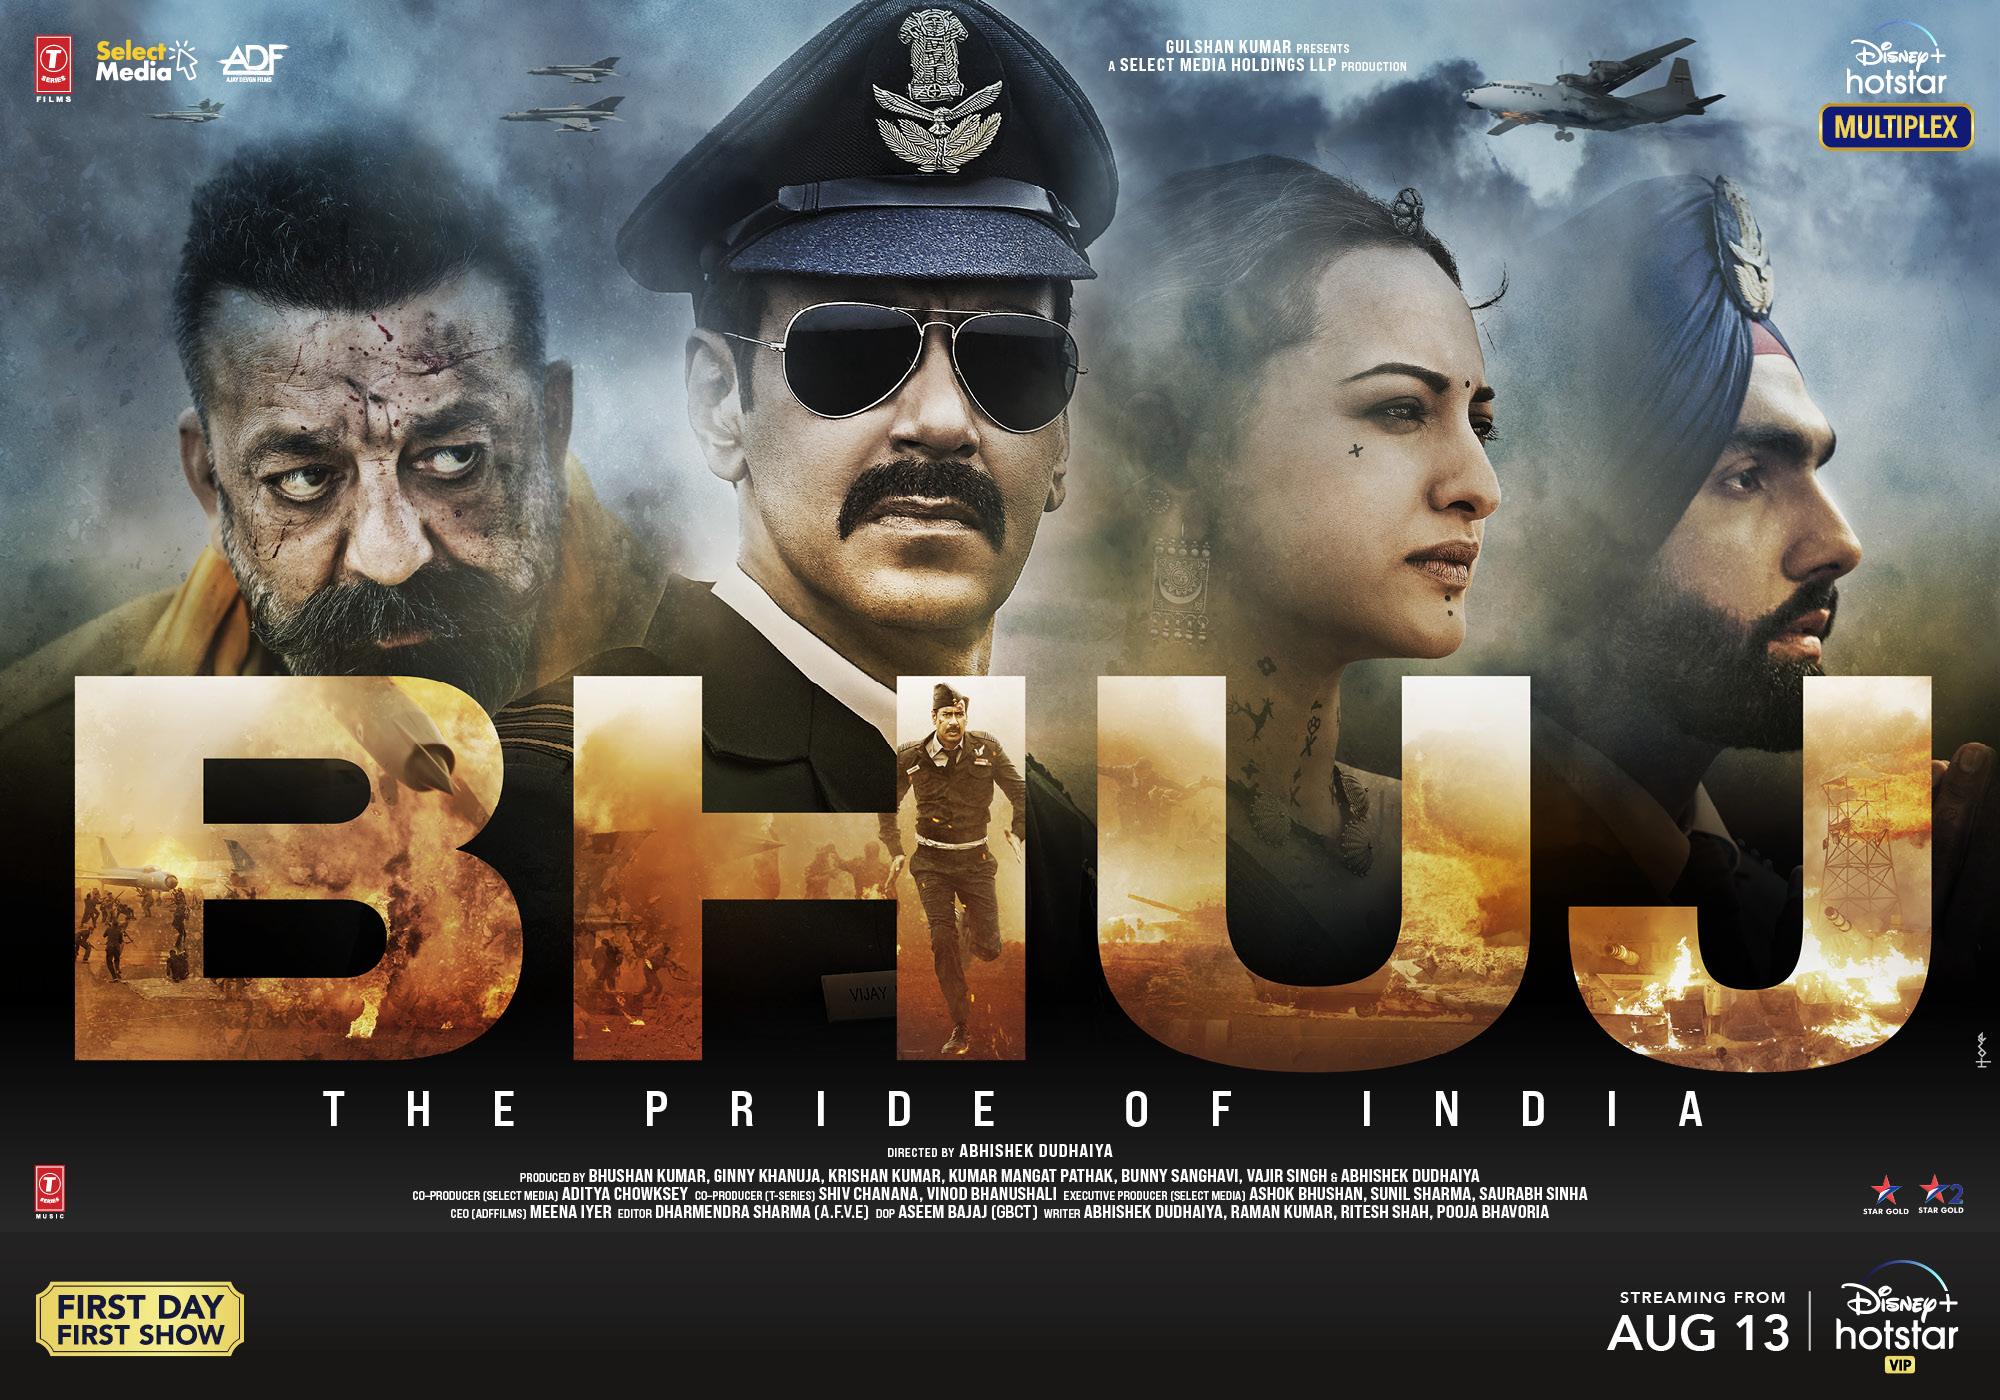 Bhuj The pride of India Release Date, भुज द प्राइड ऑफ इंडिया रिलीज Bhuj The Pride Of India, Bhuj The Pride of India Release Date, Bhuj The Pride of India Star Cast,